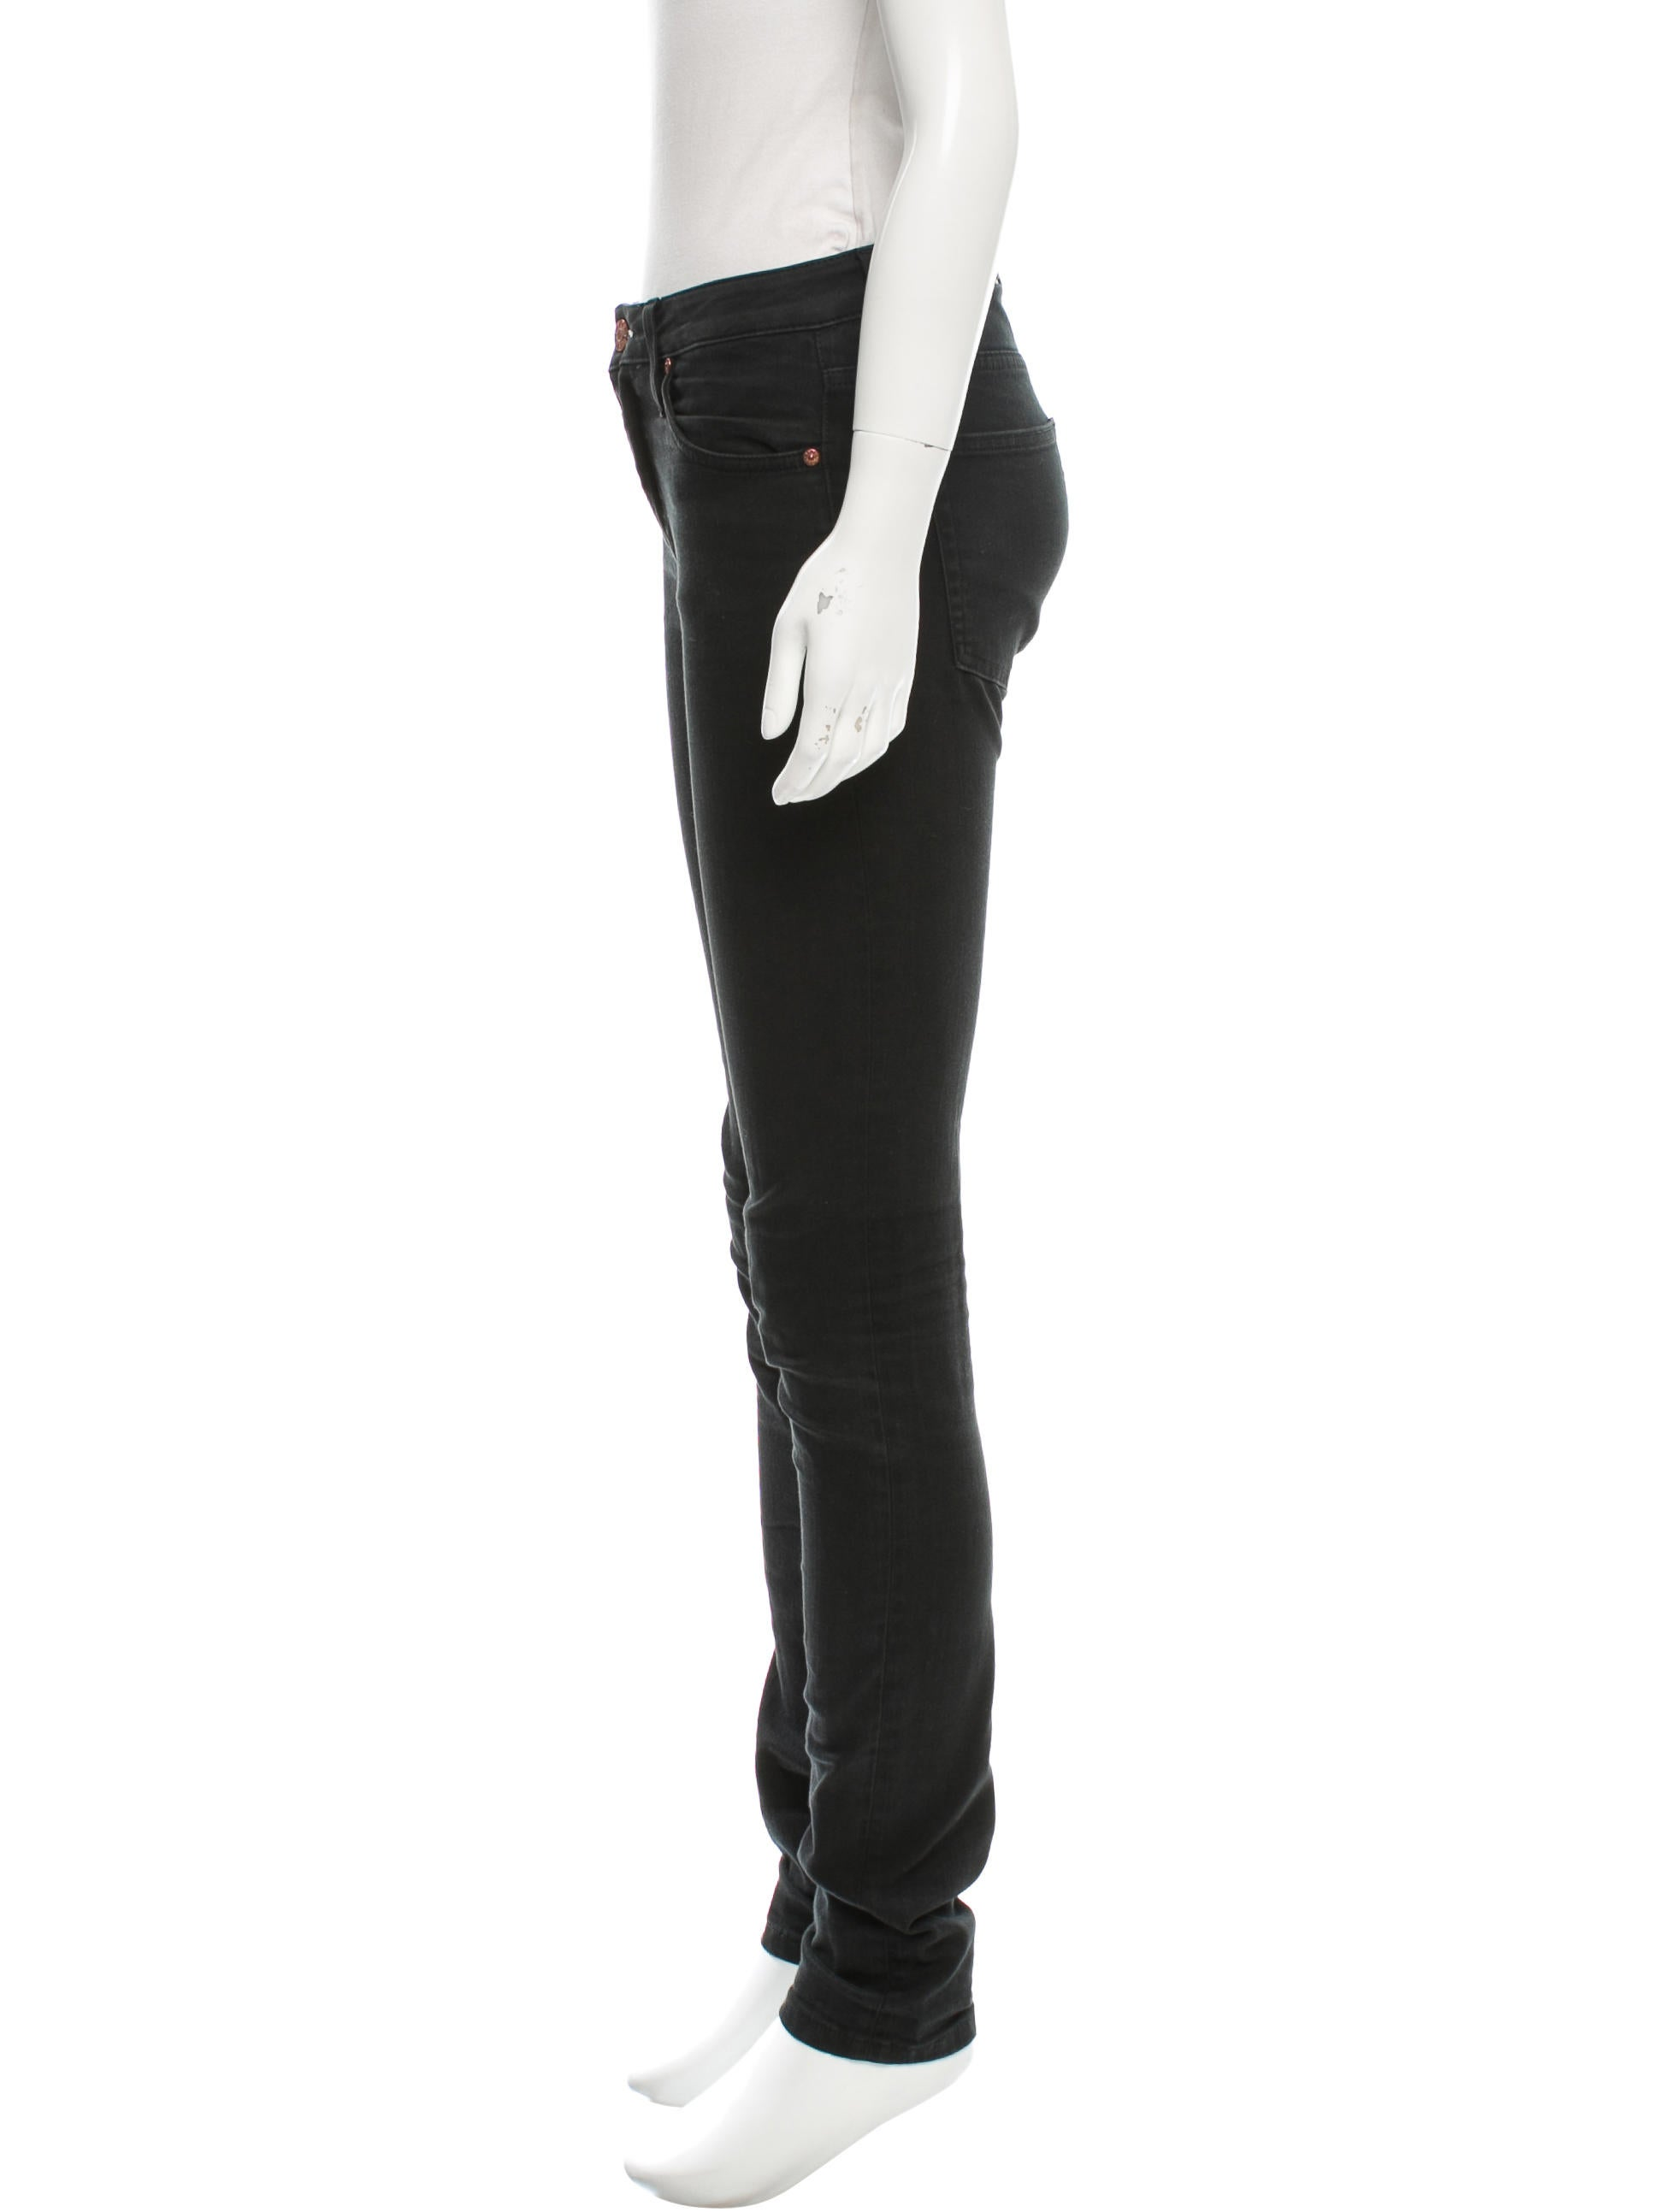 Free shipping and returns on Women's Black Jeans & Denim at smashingprogrammsrj.tk